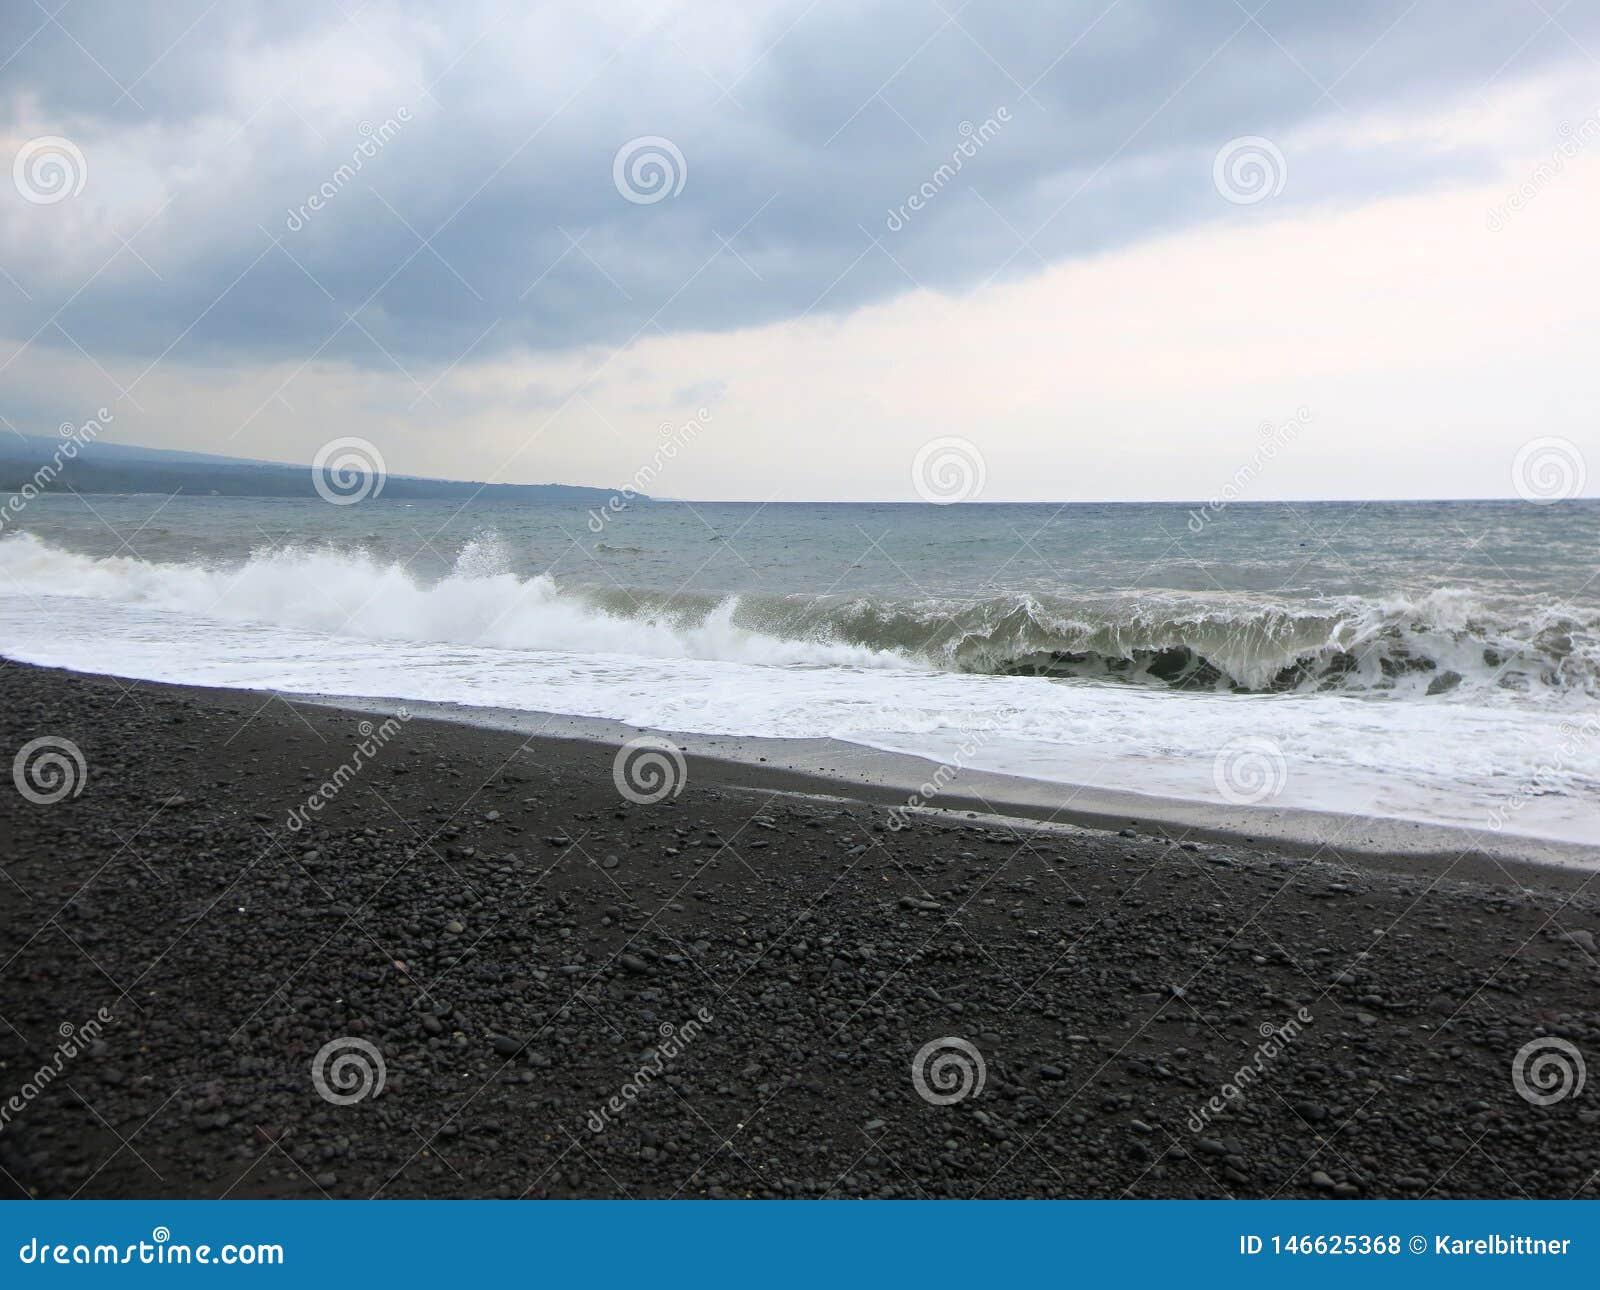 Sea surf and waves crashing against a black sand beach in Bali.